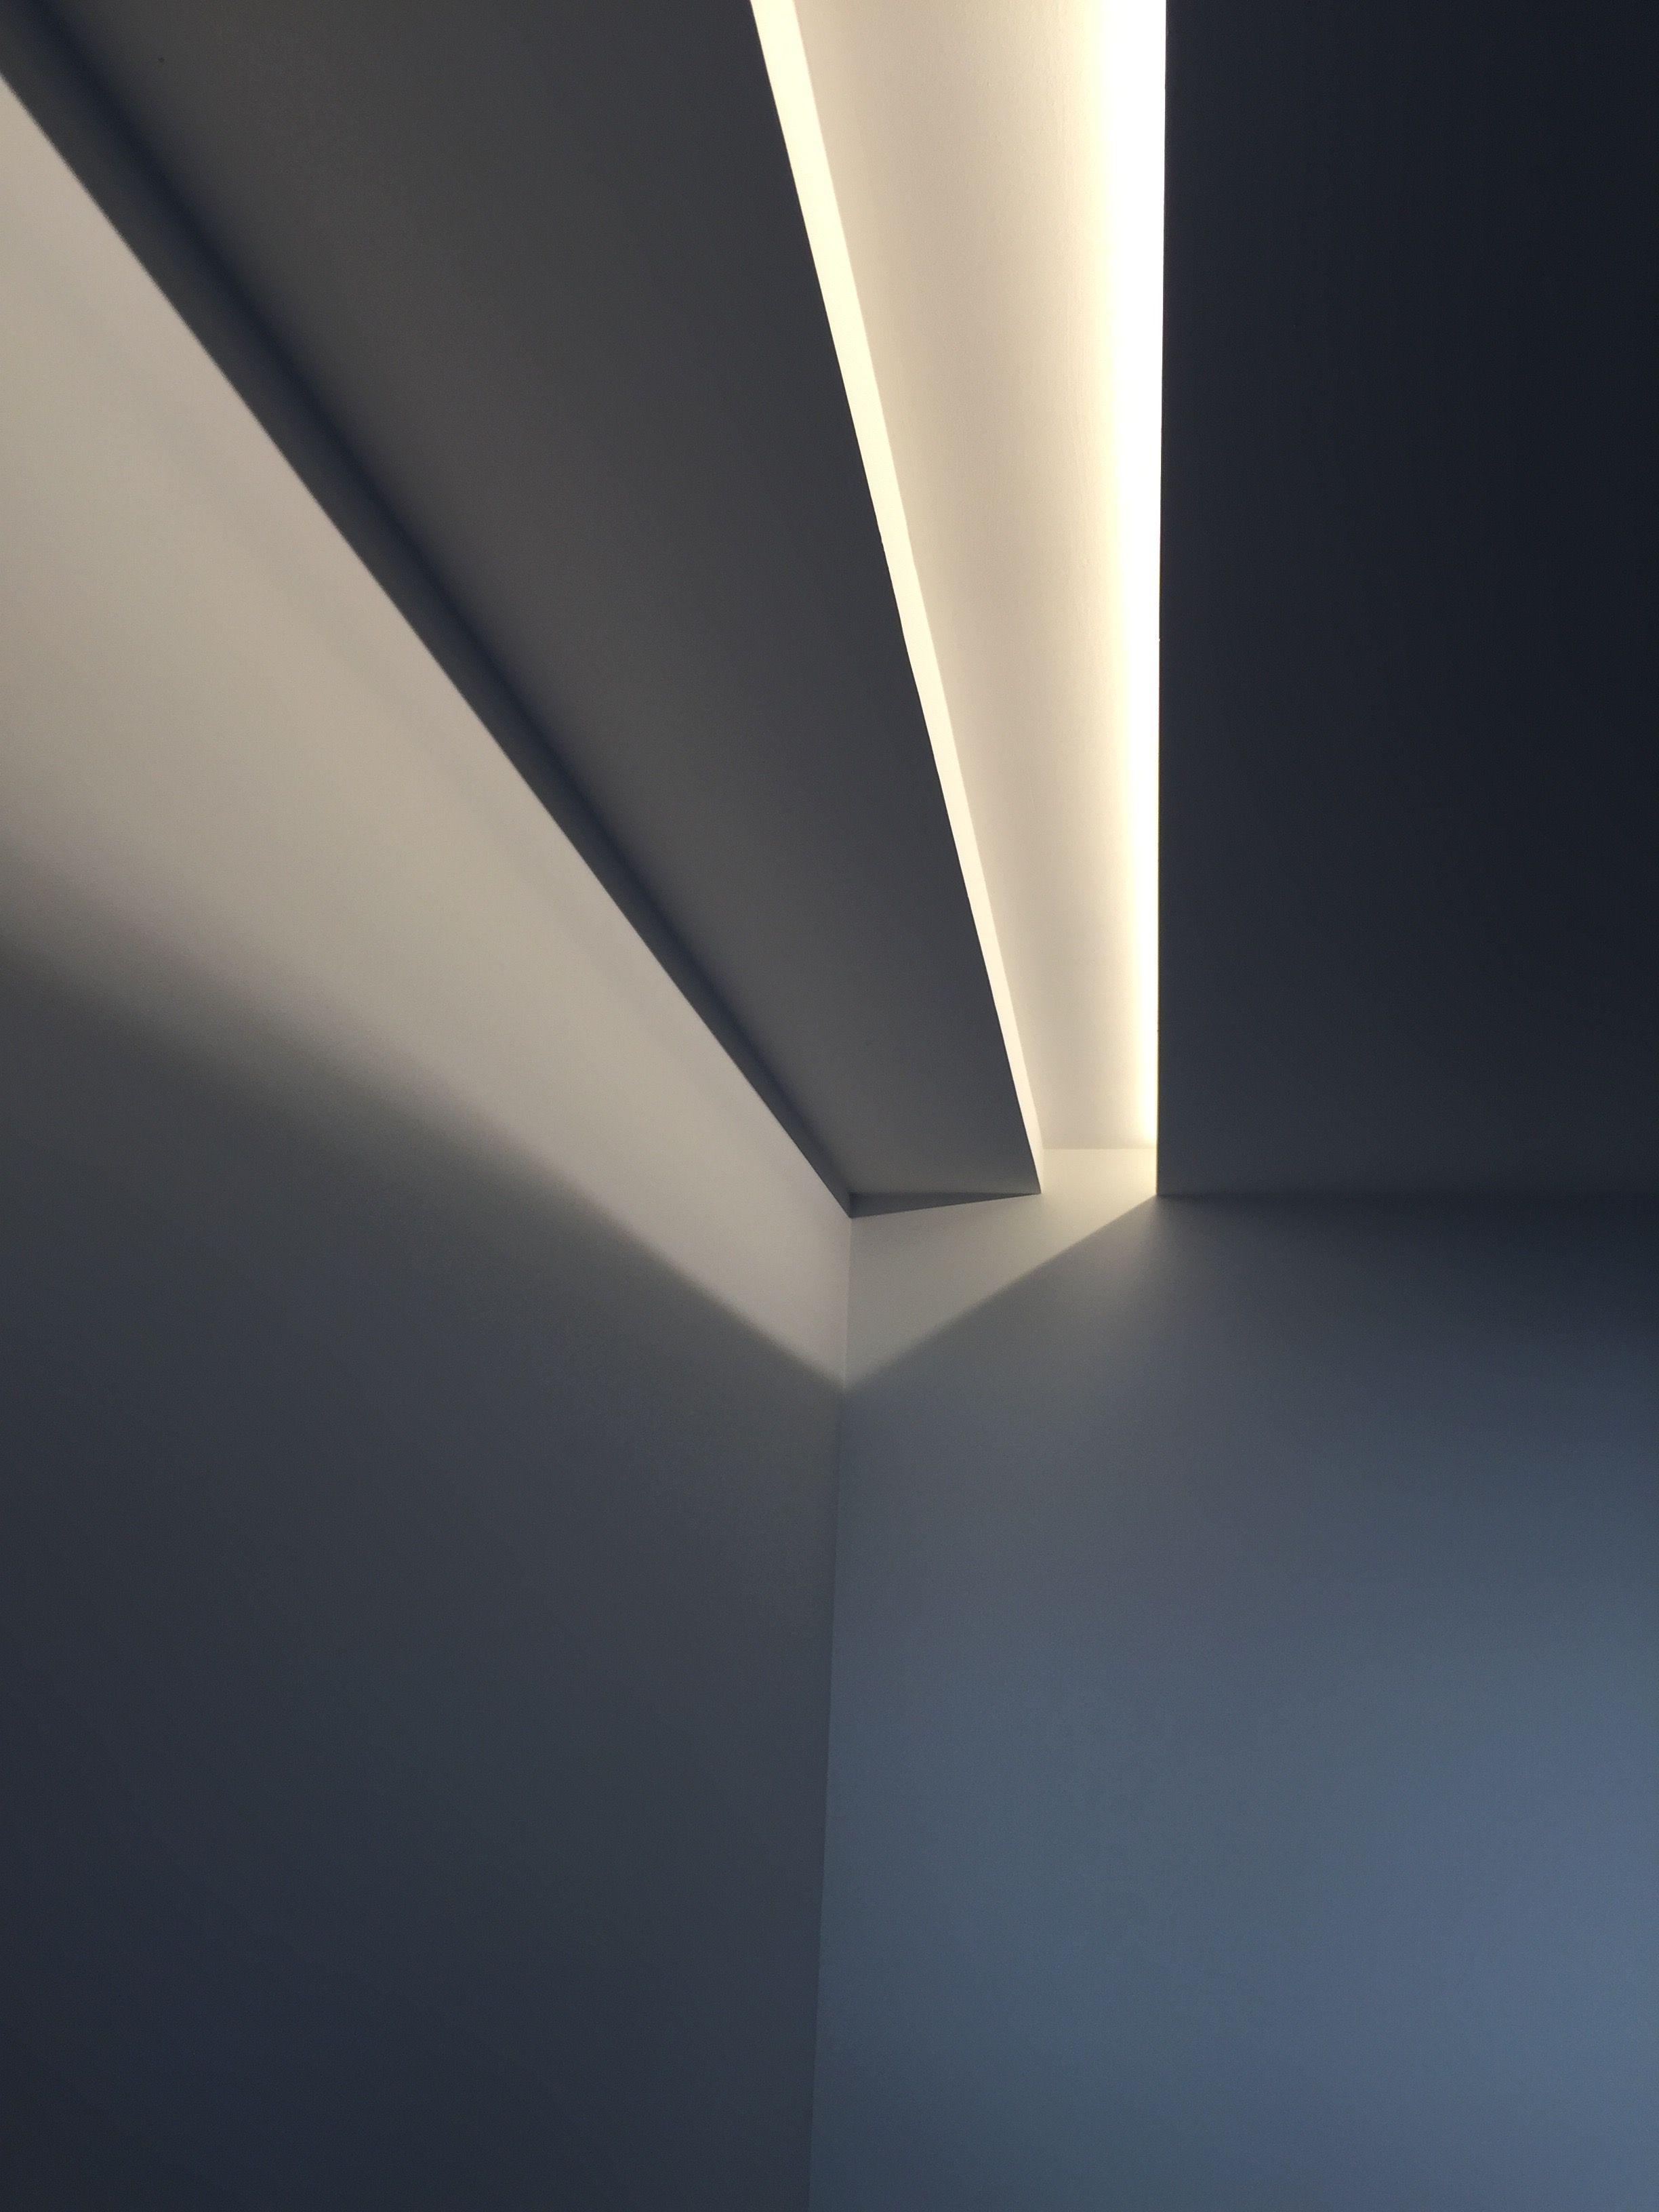 Iluminaci n led mediante luz indirecta con foseado en pladur pinterest salle de - Iluminacion indirecta led ...